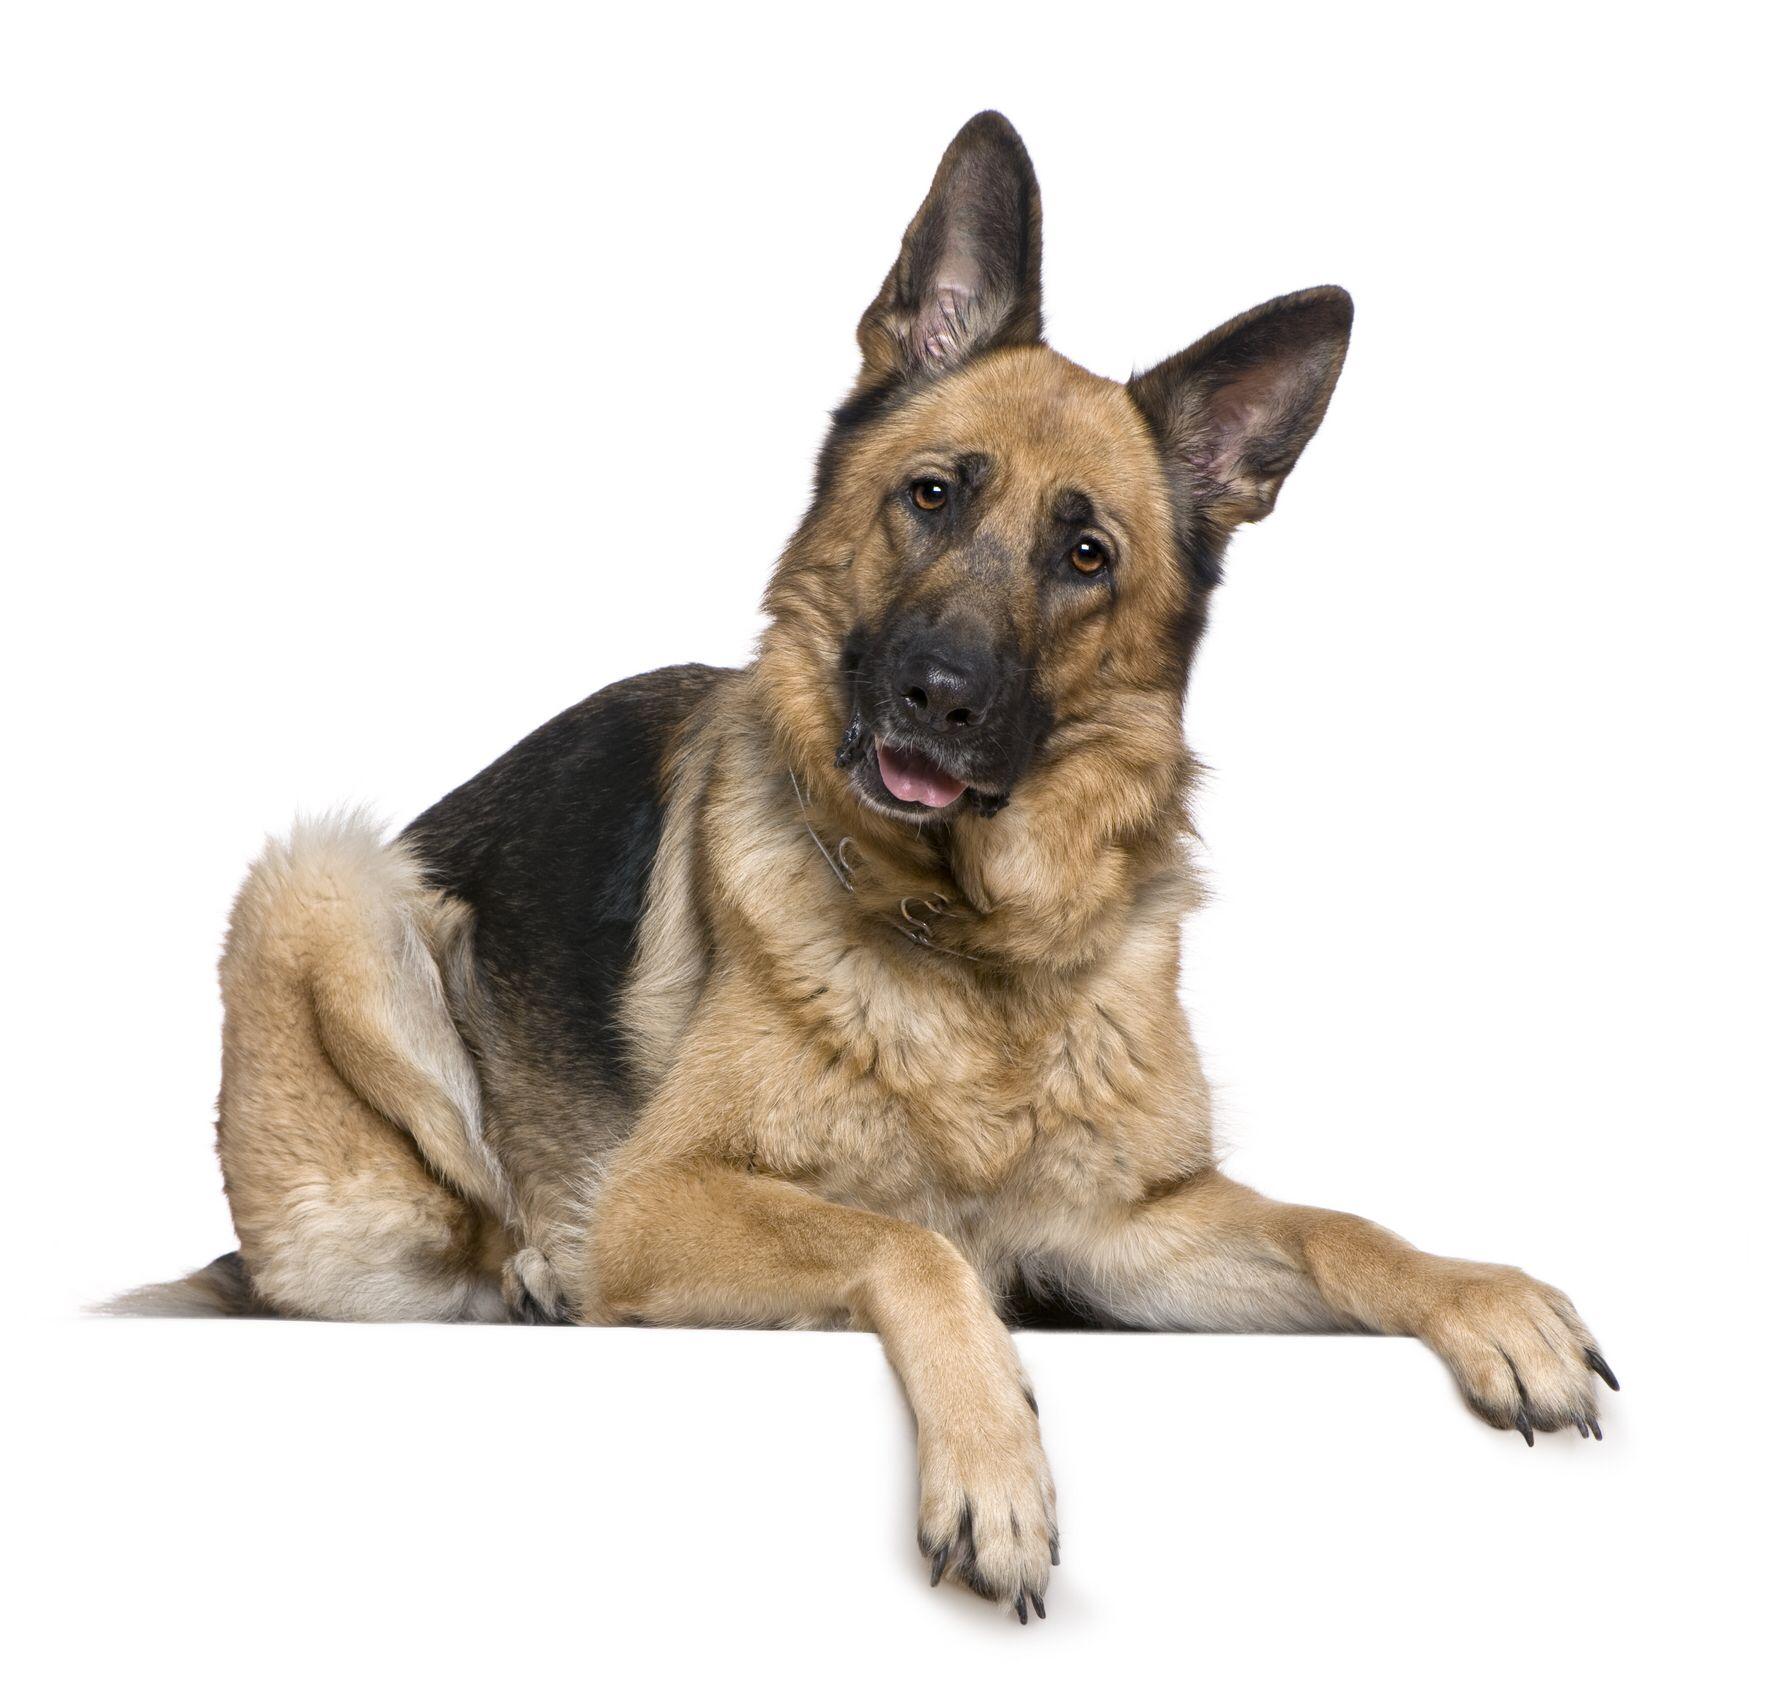 Idea by S J Chacon on German shepherds Dog training near